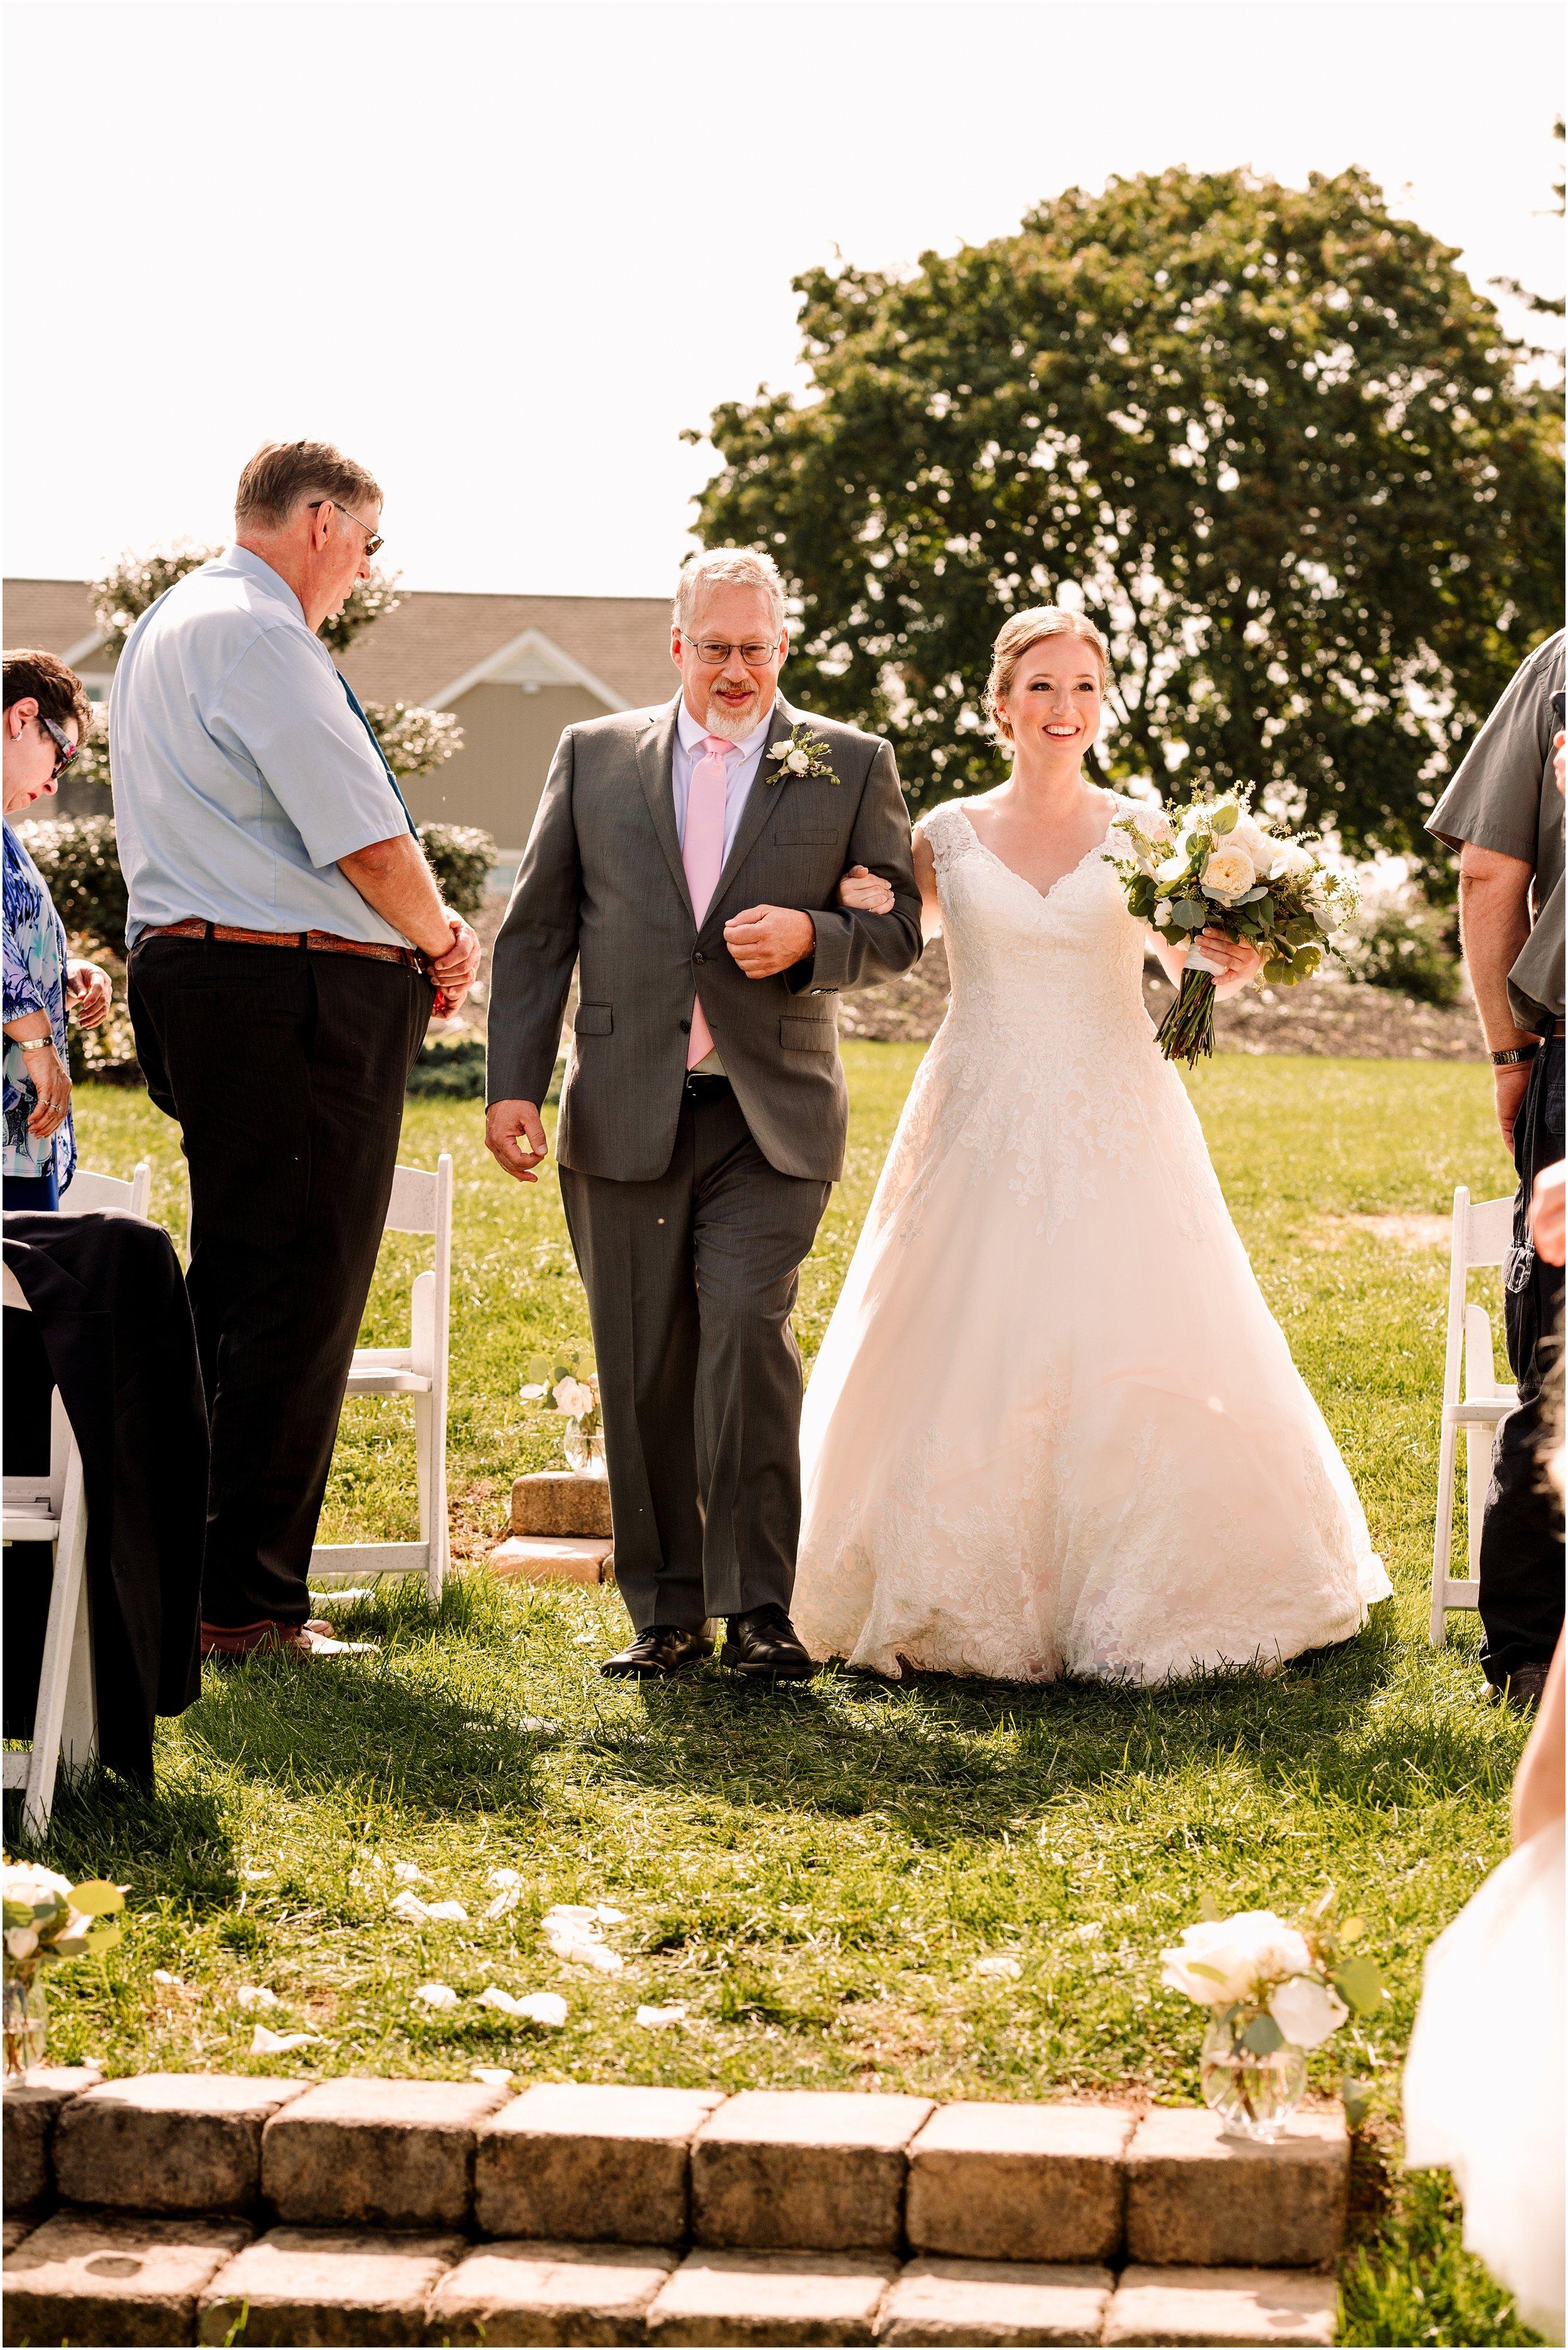 hannah leigh photography Wyndridge Farm Wedding York PA_1524.jpg